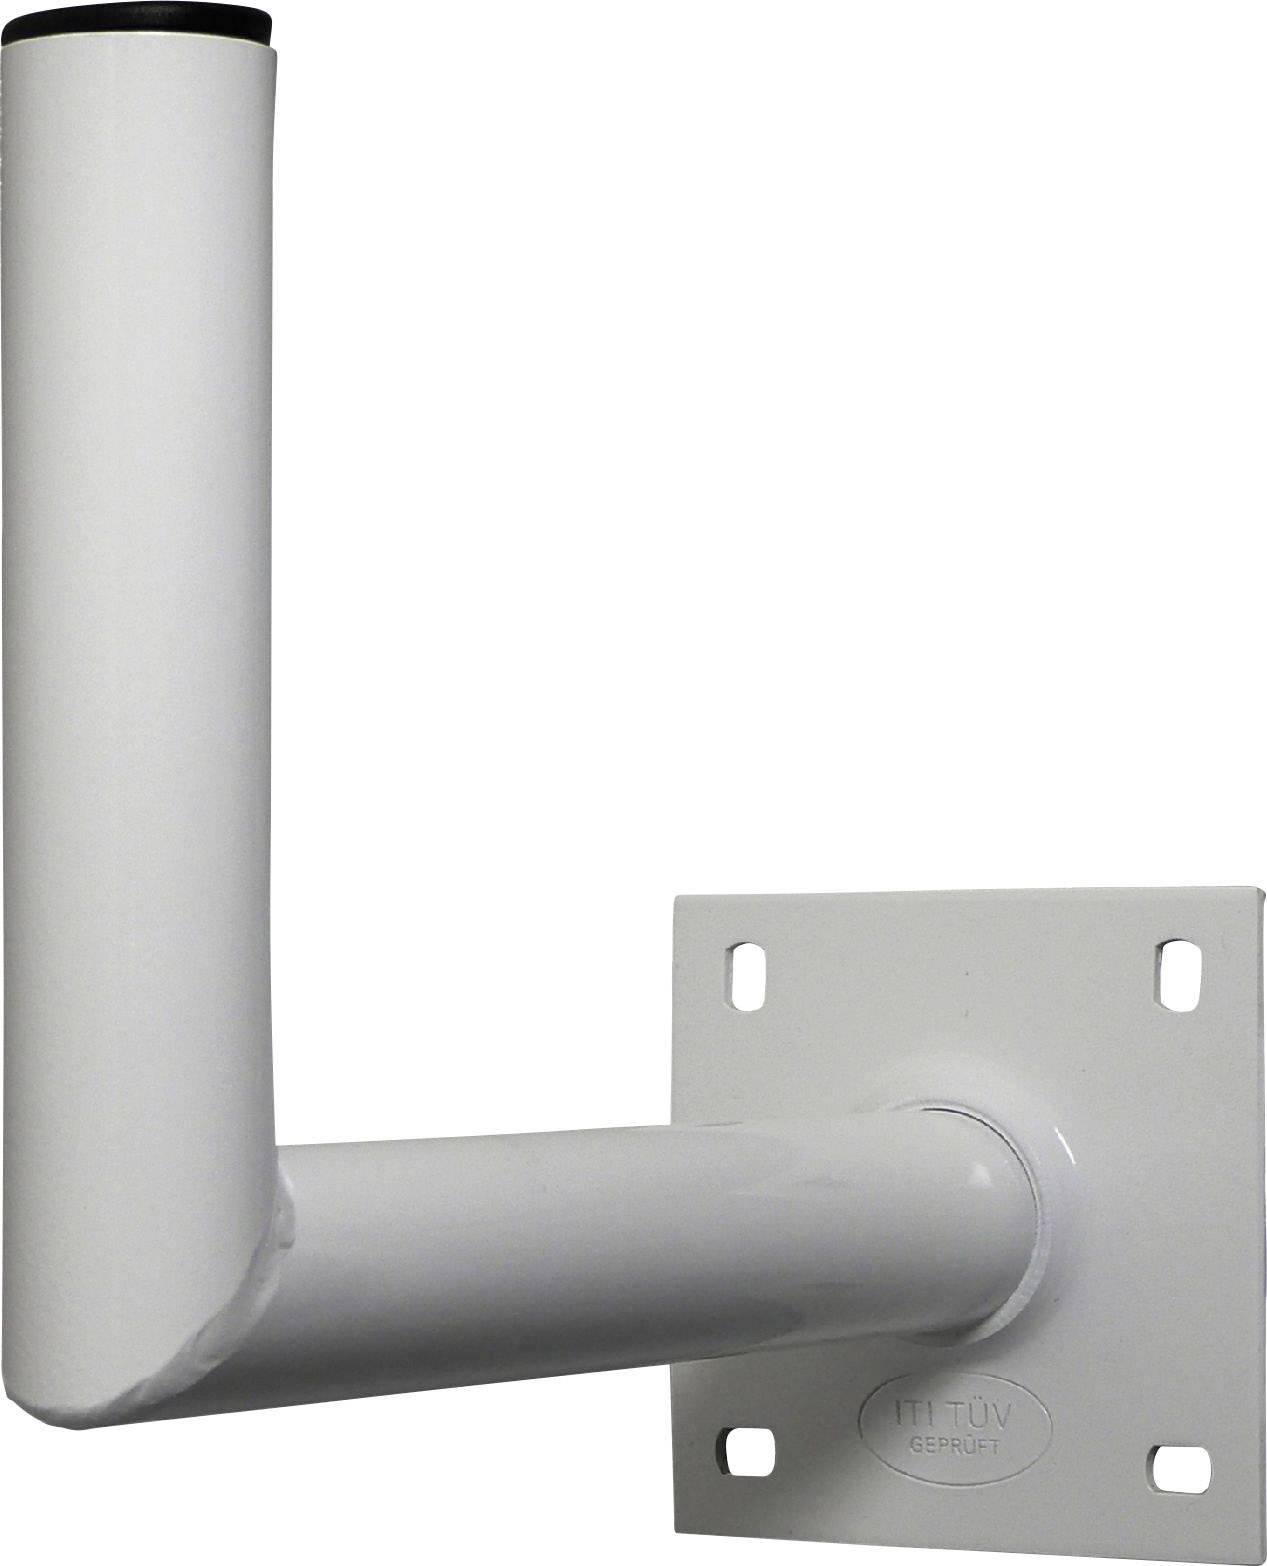 SAT stojan A.S. SAT 10735, 25 cm, Ø do 90 cm, hliník, bílá